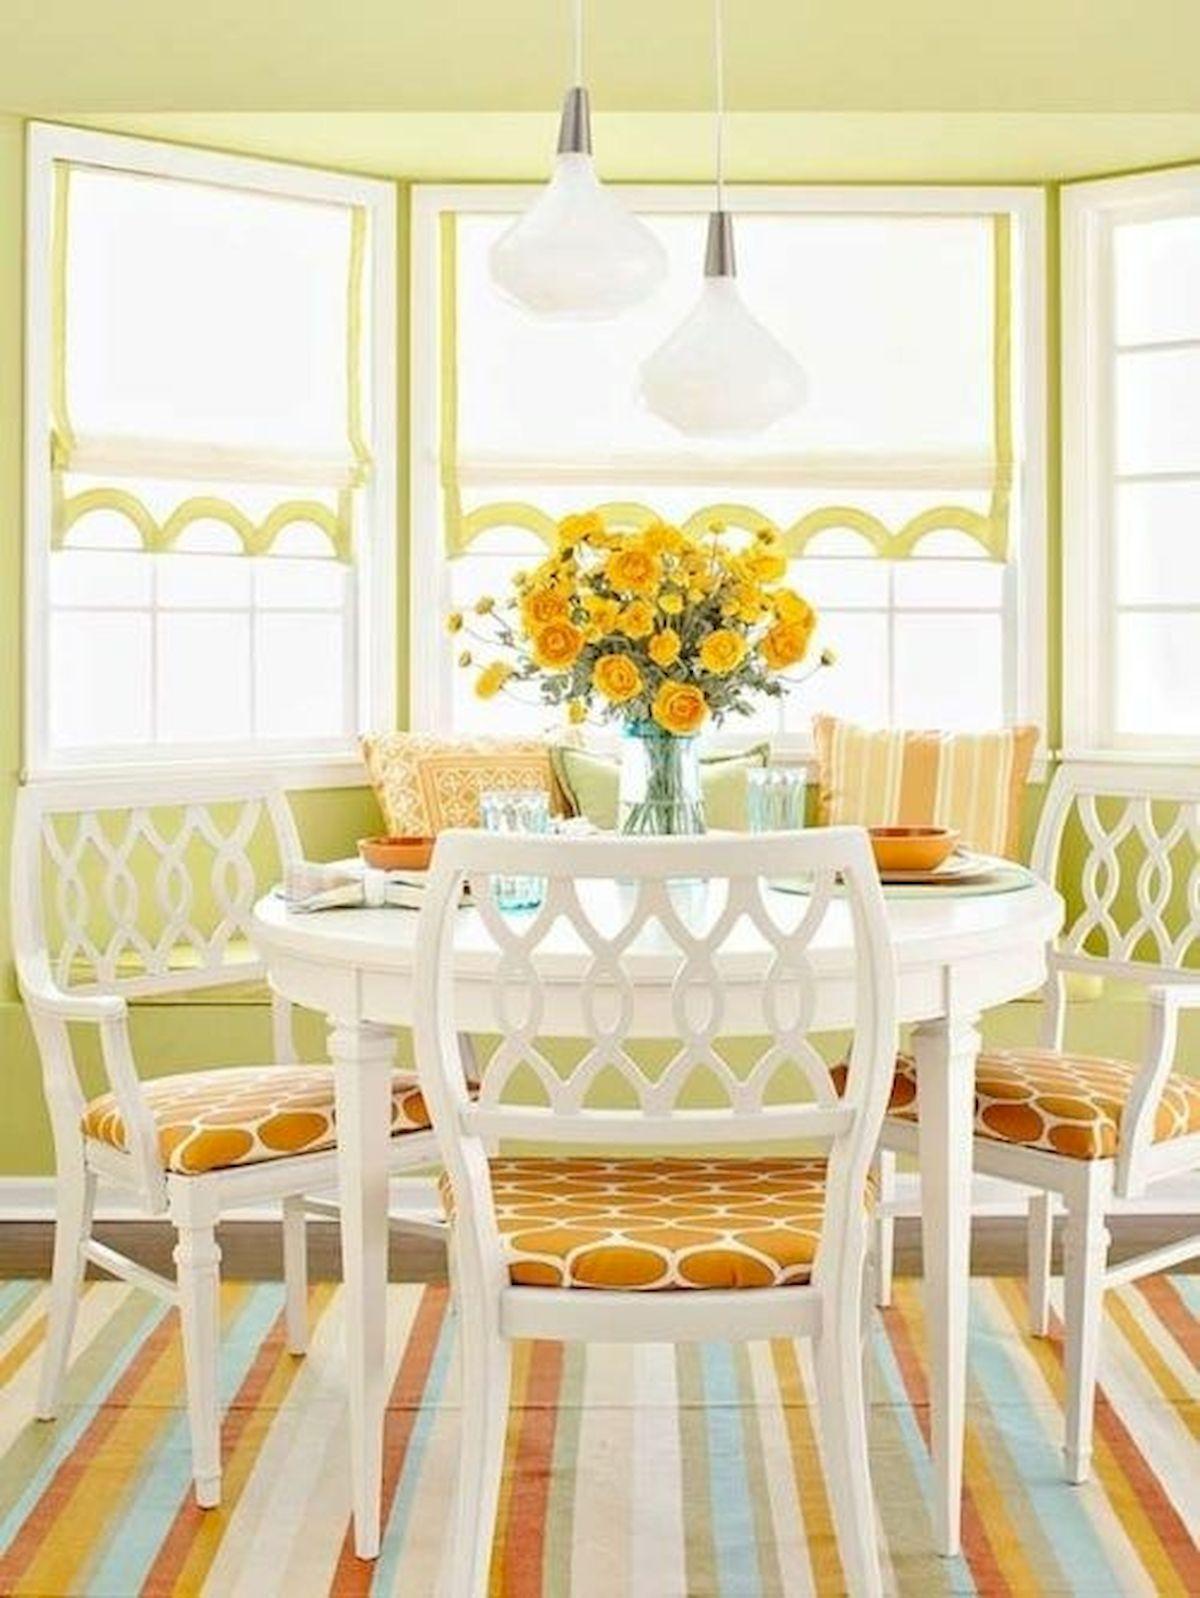 45 Colorful Interior Home Design and Decor Ideas (41)